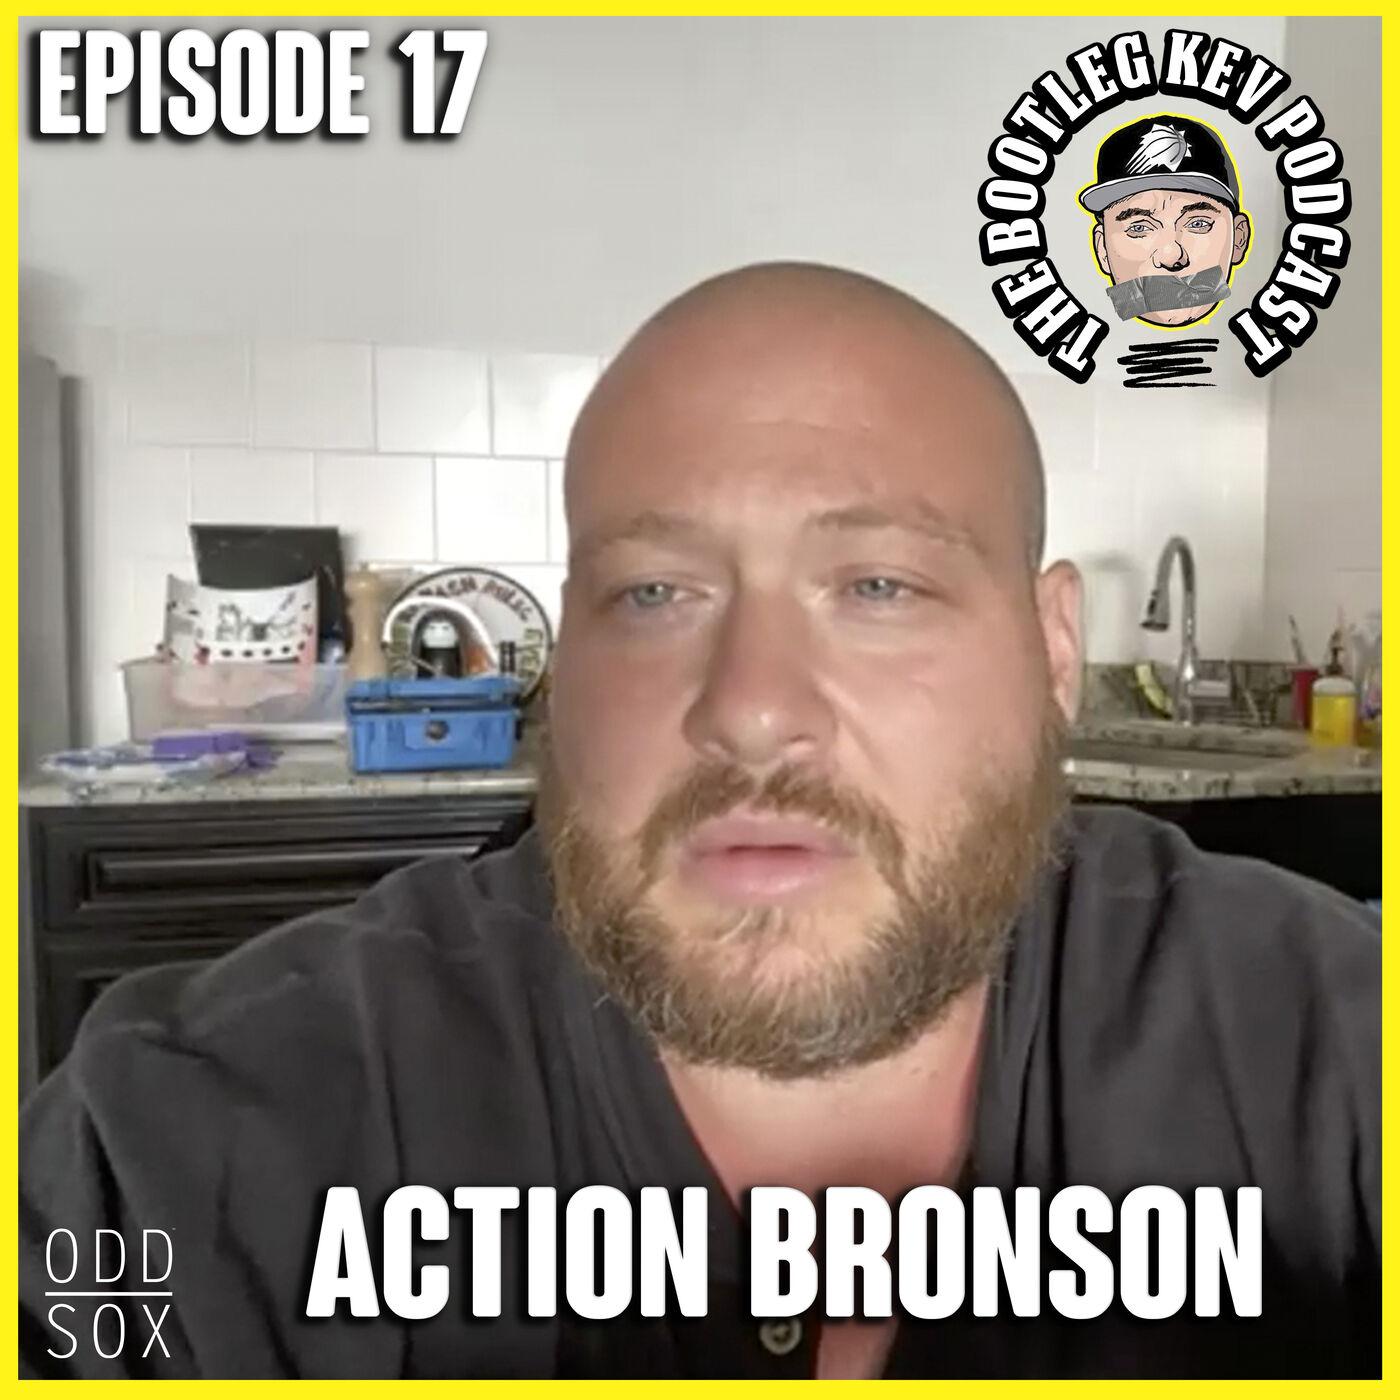 #17 - Action Bronson